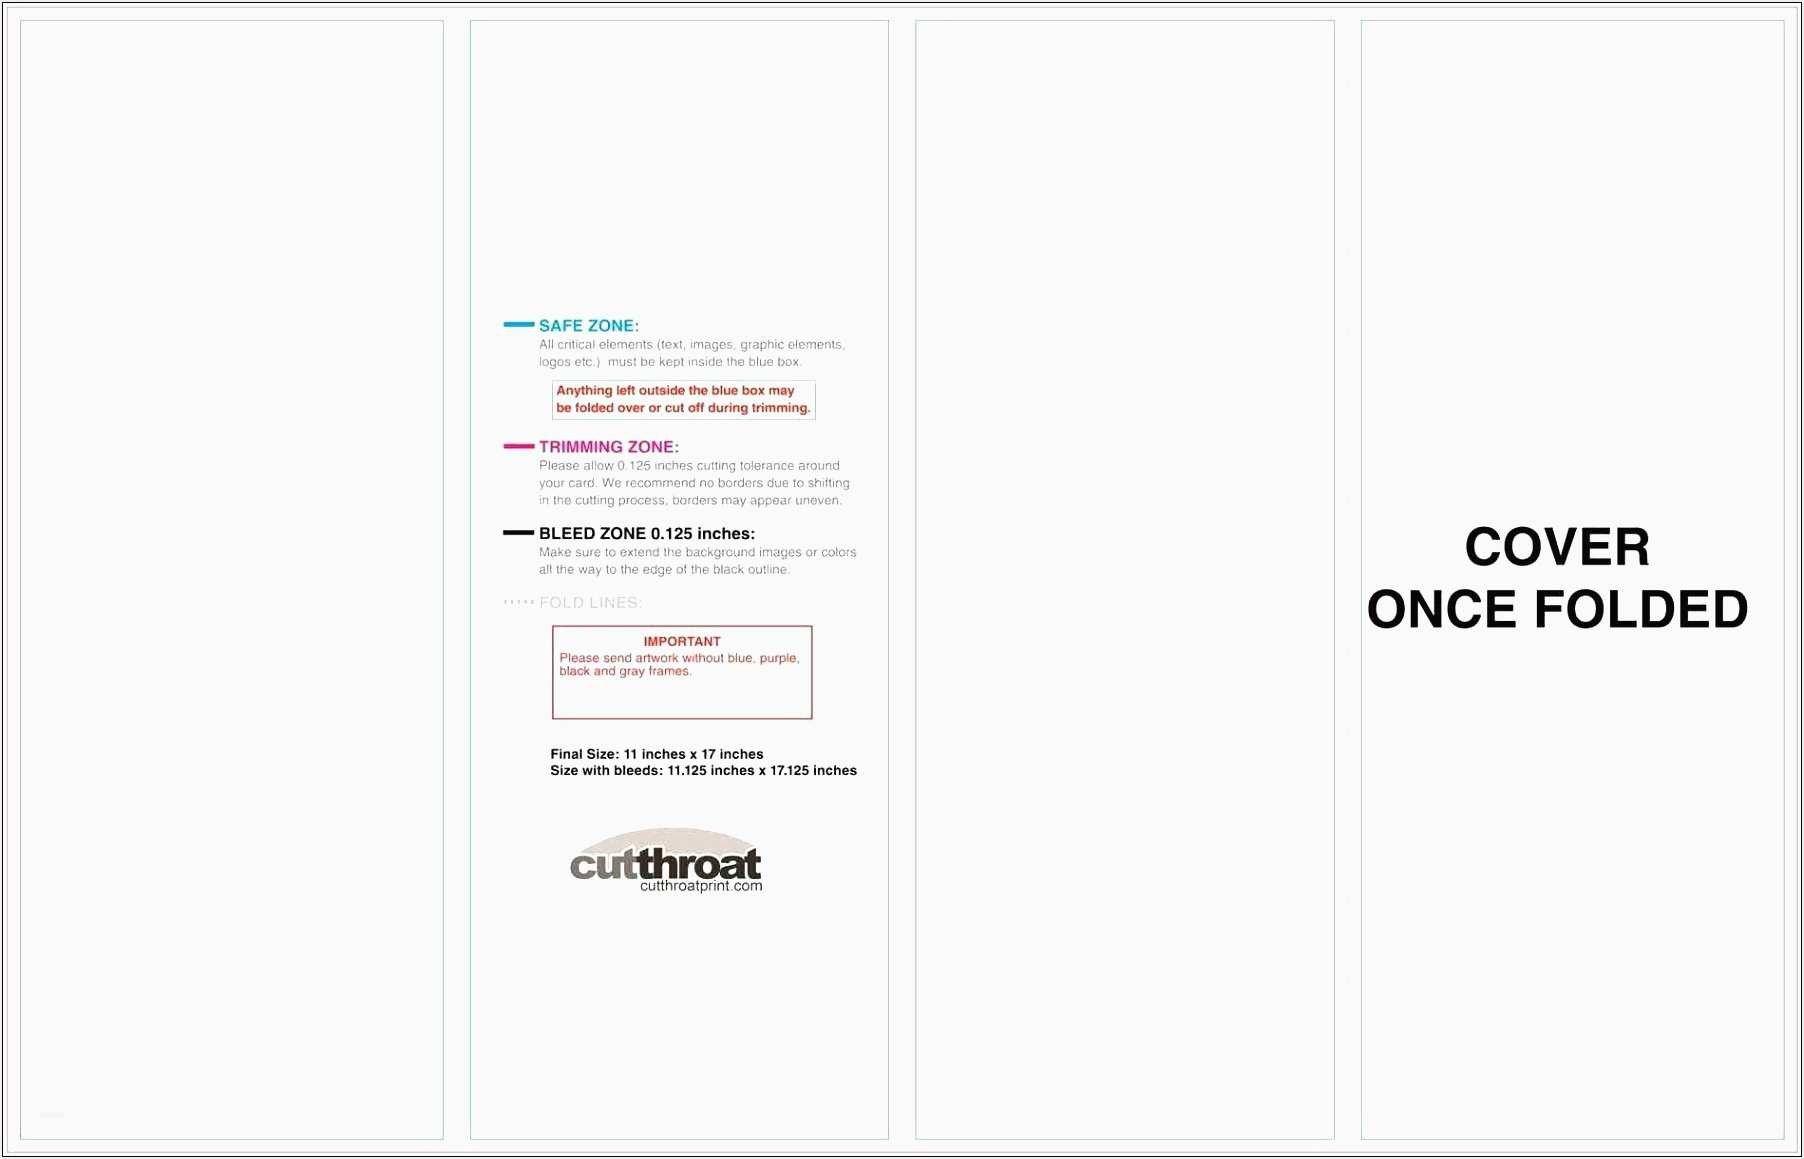 Quarter Fold Card Template 12 13 Blank Quarter Fold Card Template